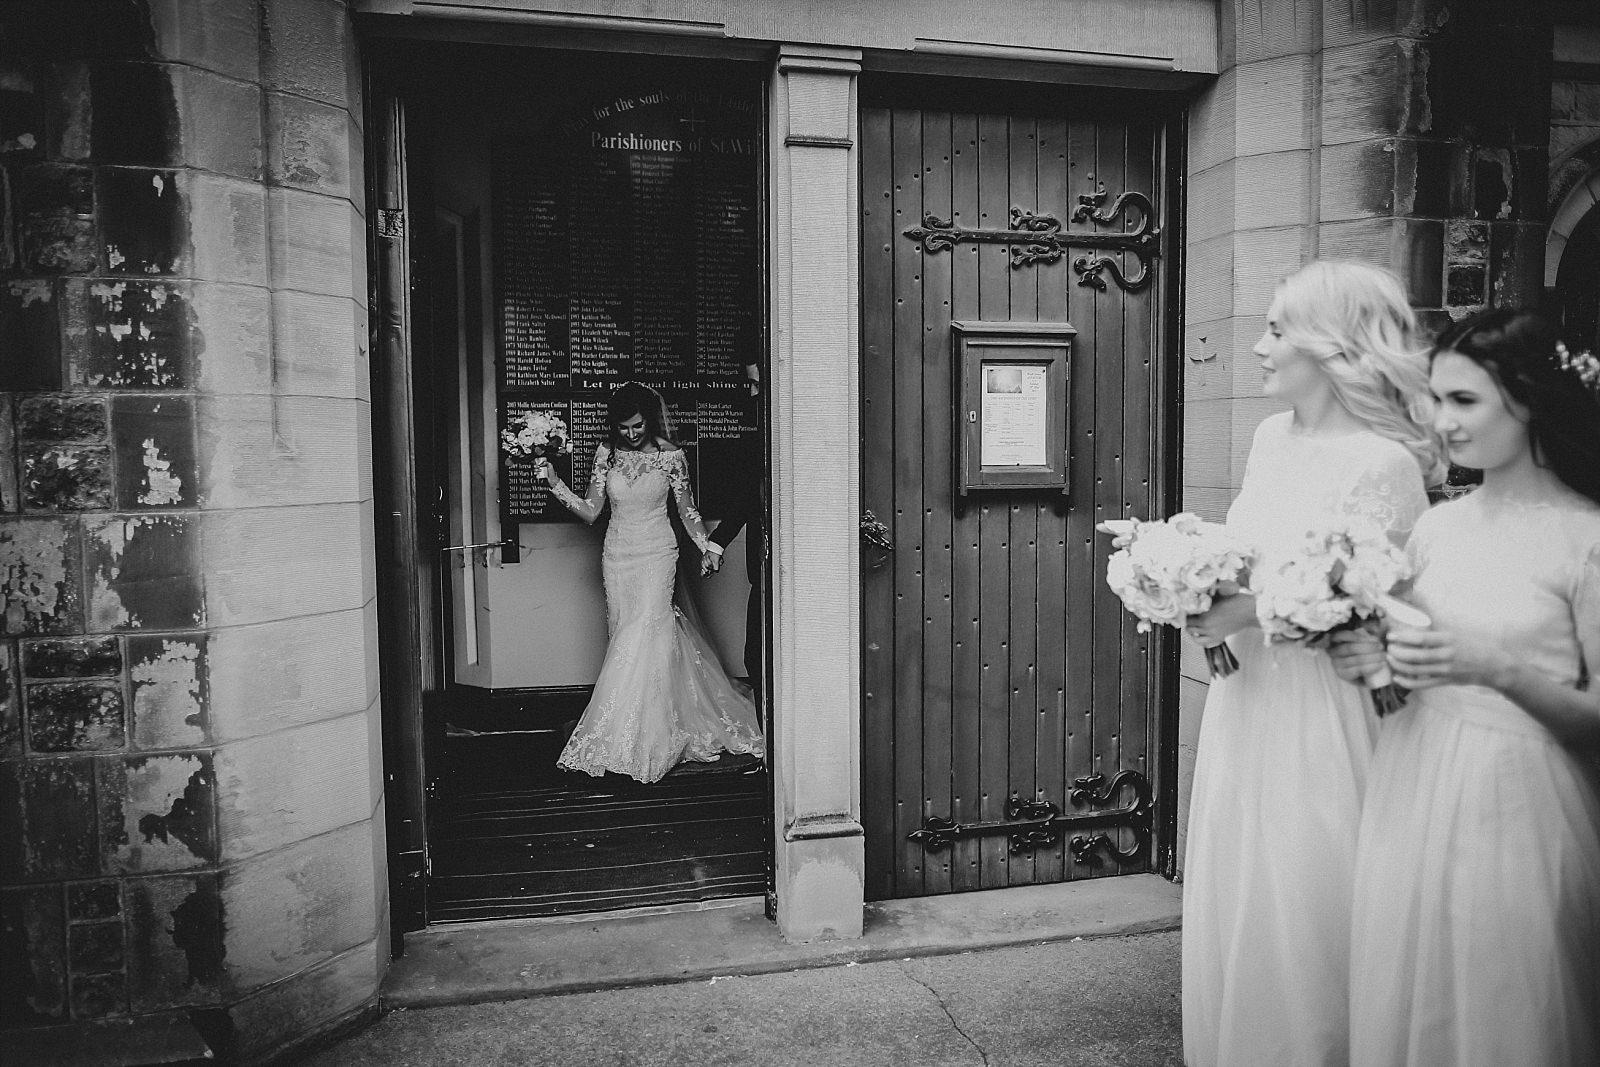 bridesmaids await the newlyweds